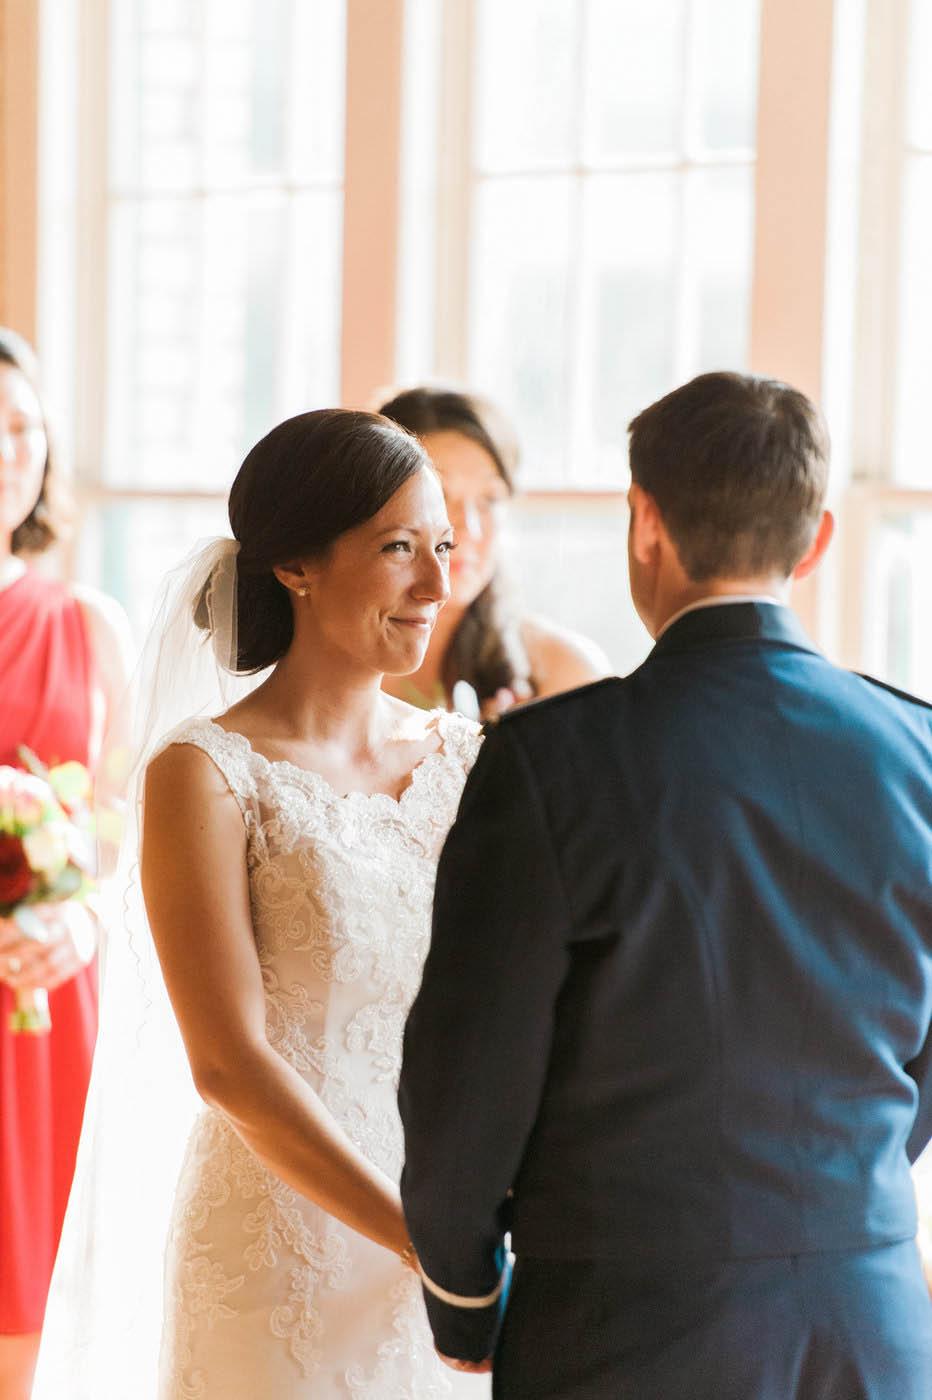 stockroom-at-230-wedding-8.jpg